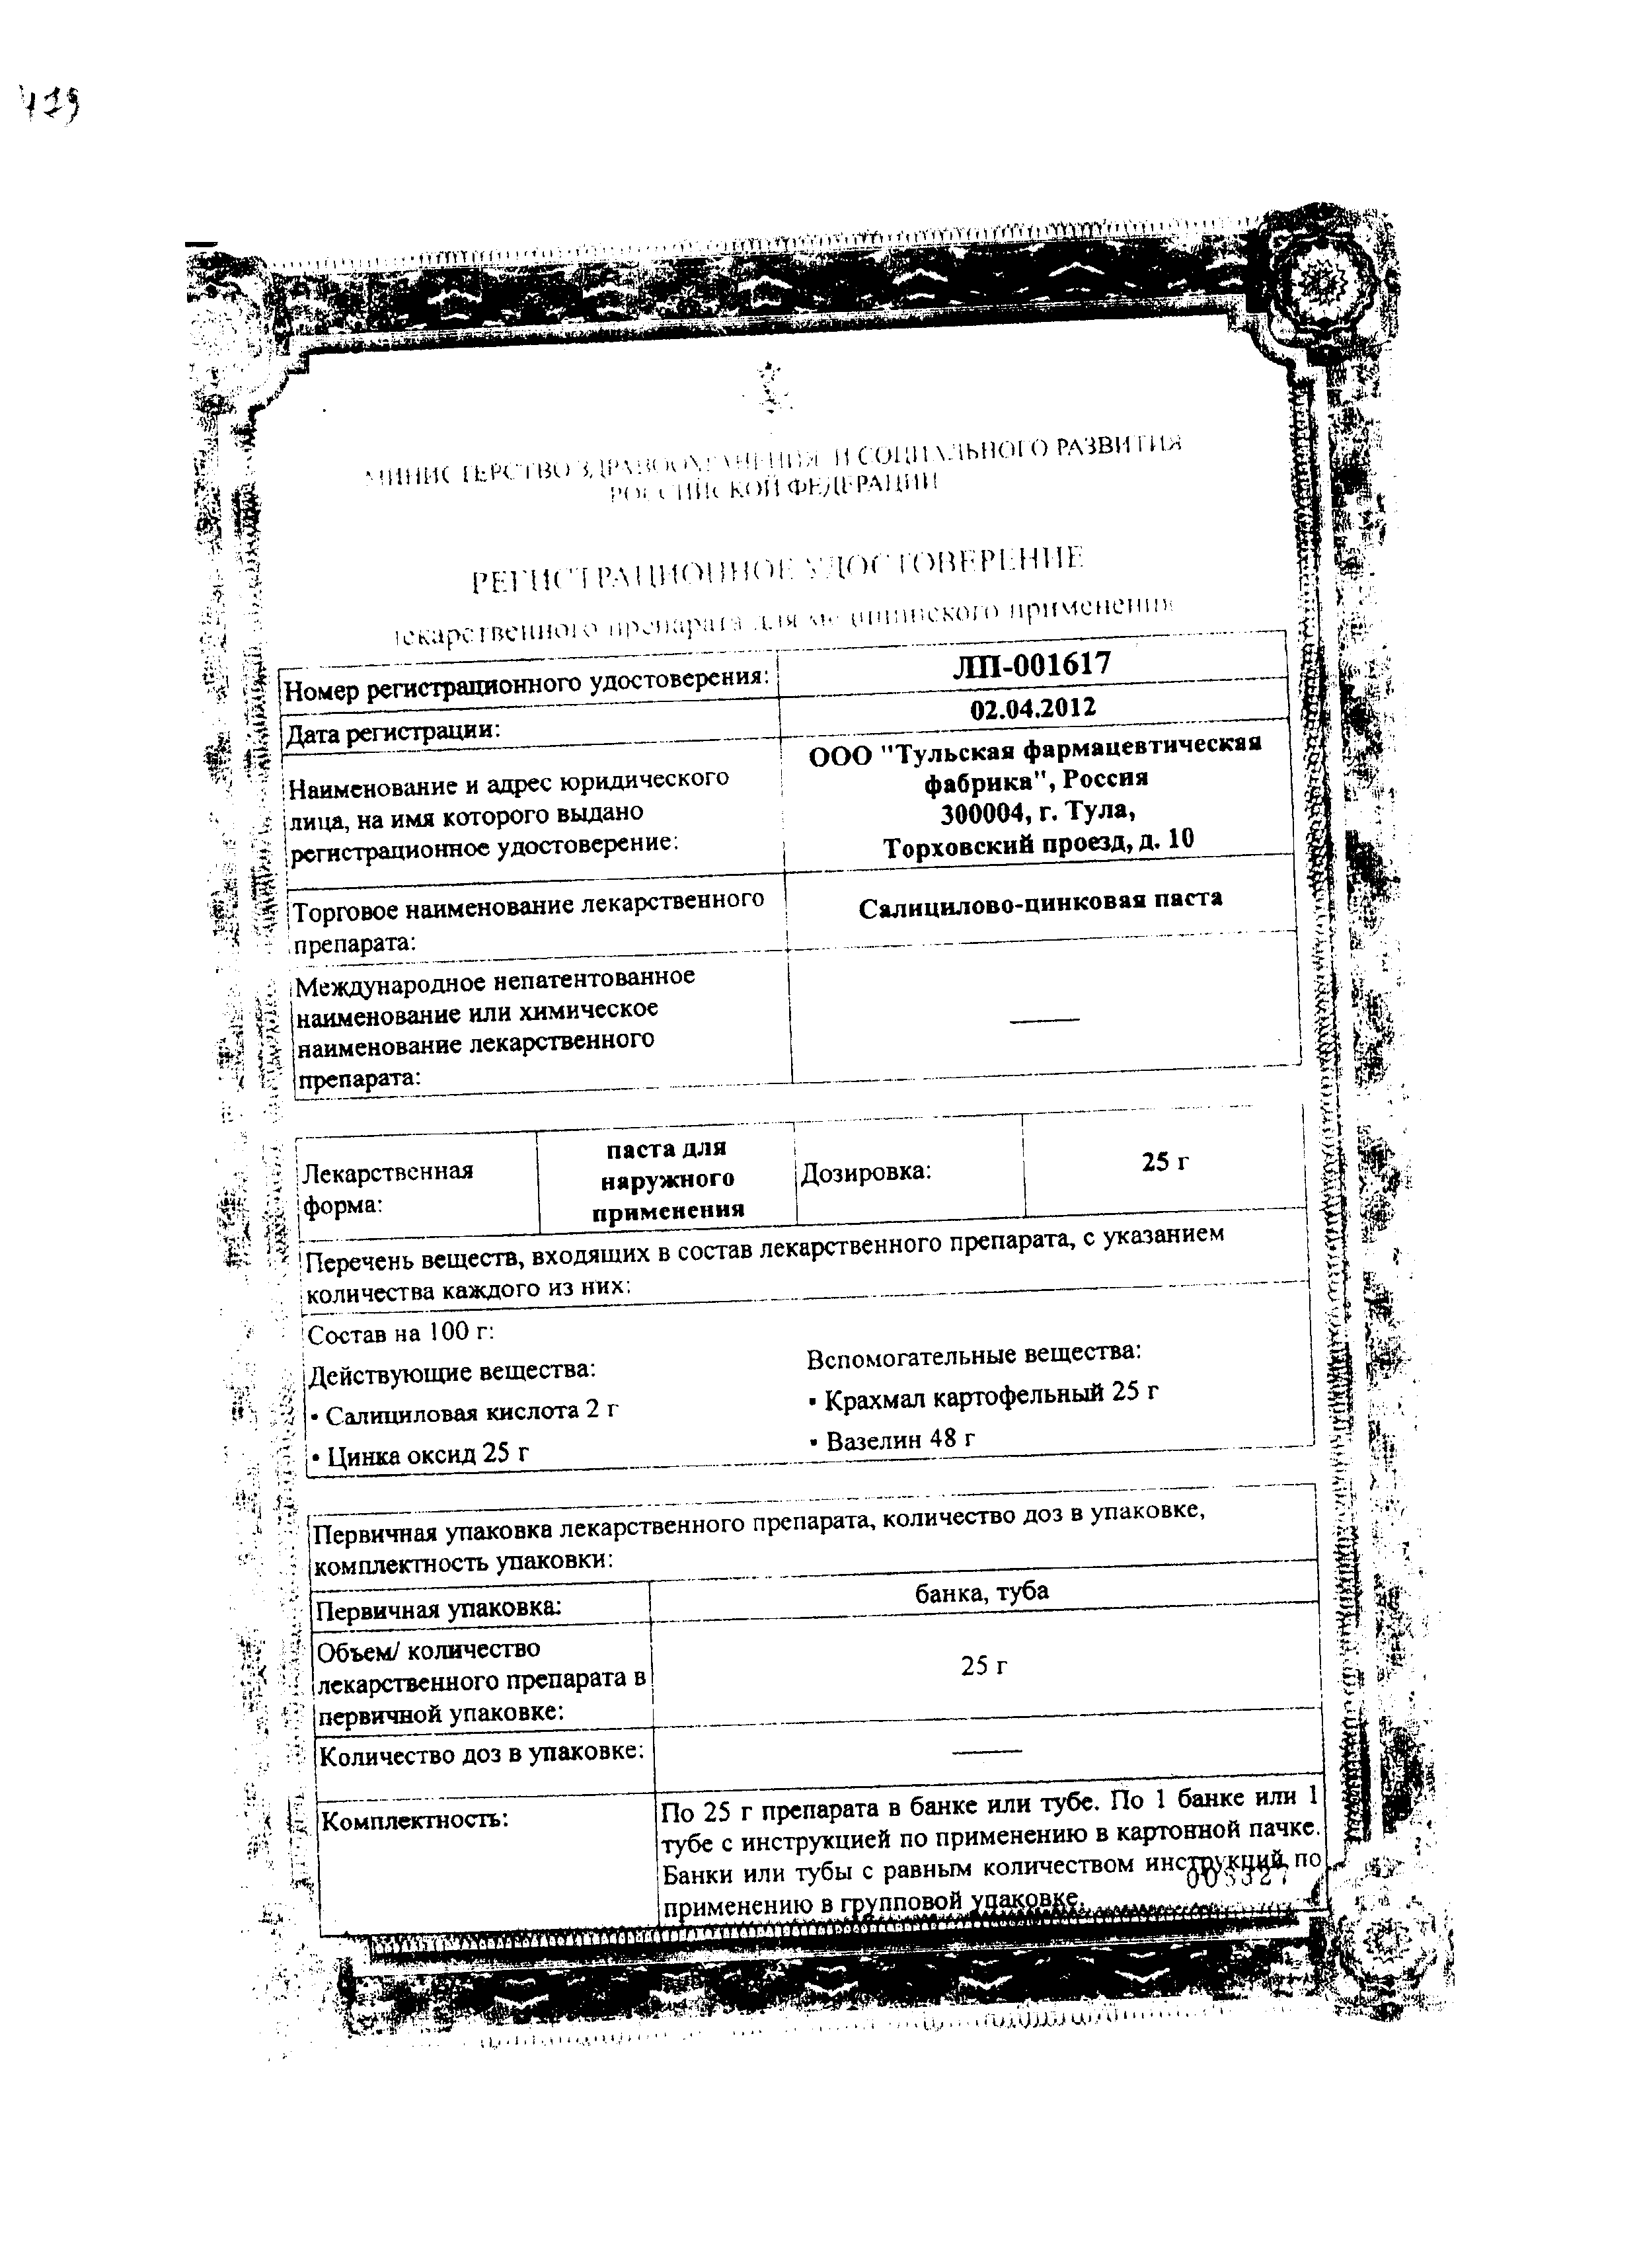 Салицилово-цинковая паста сертификат